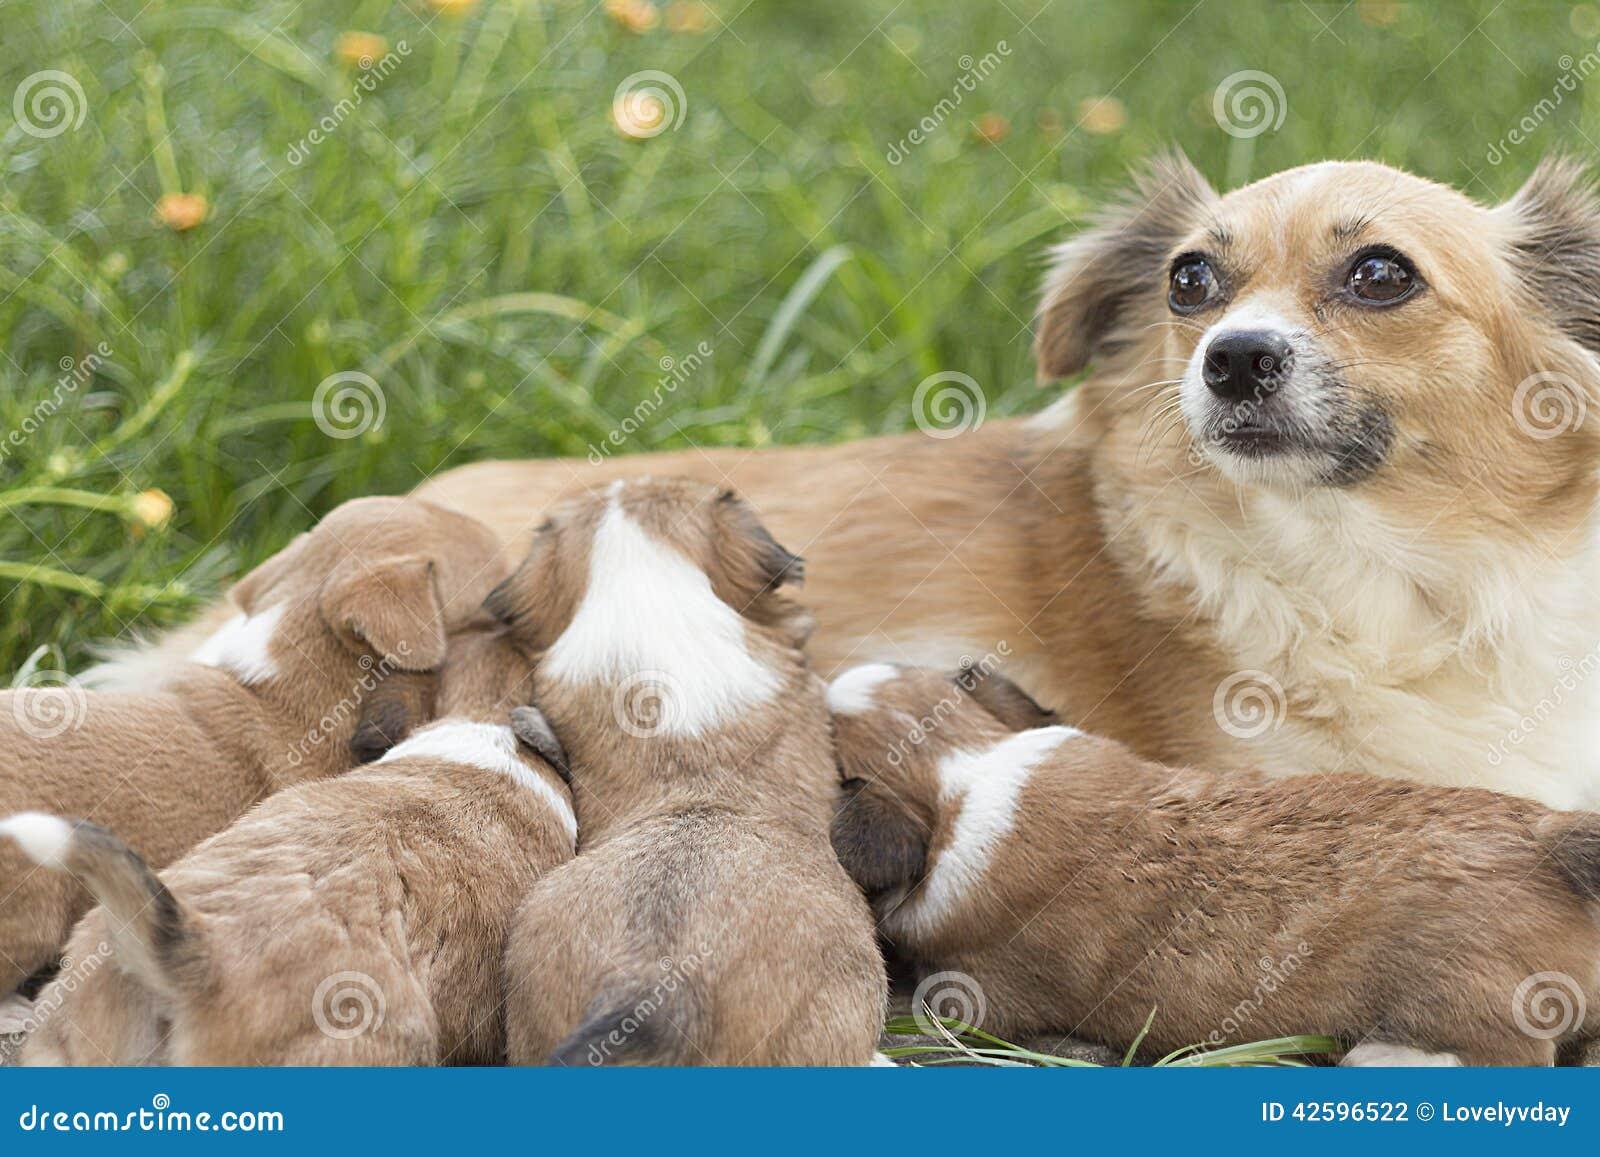 Chihuahua Dog Baby Eat Milk. Stock Photo - Image: 42596522